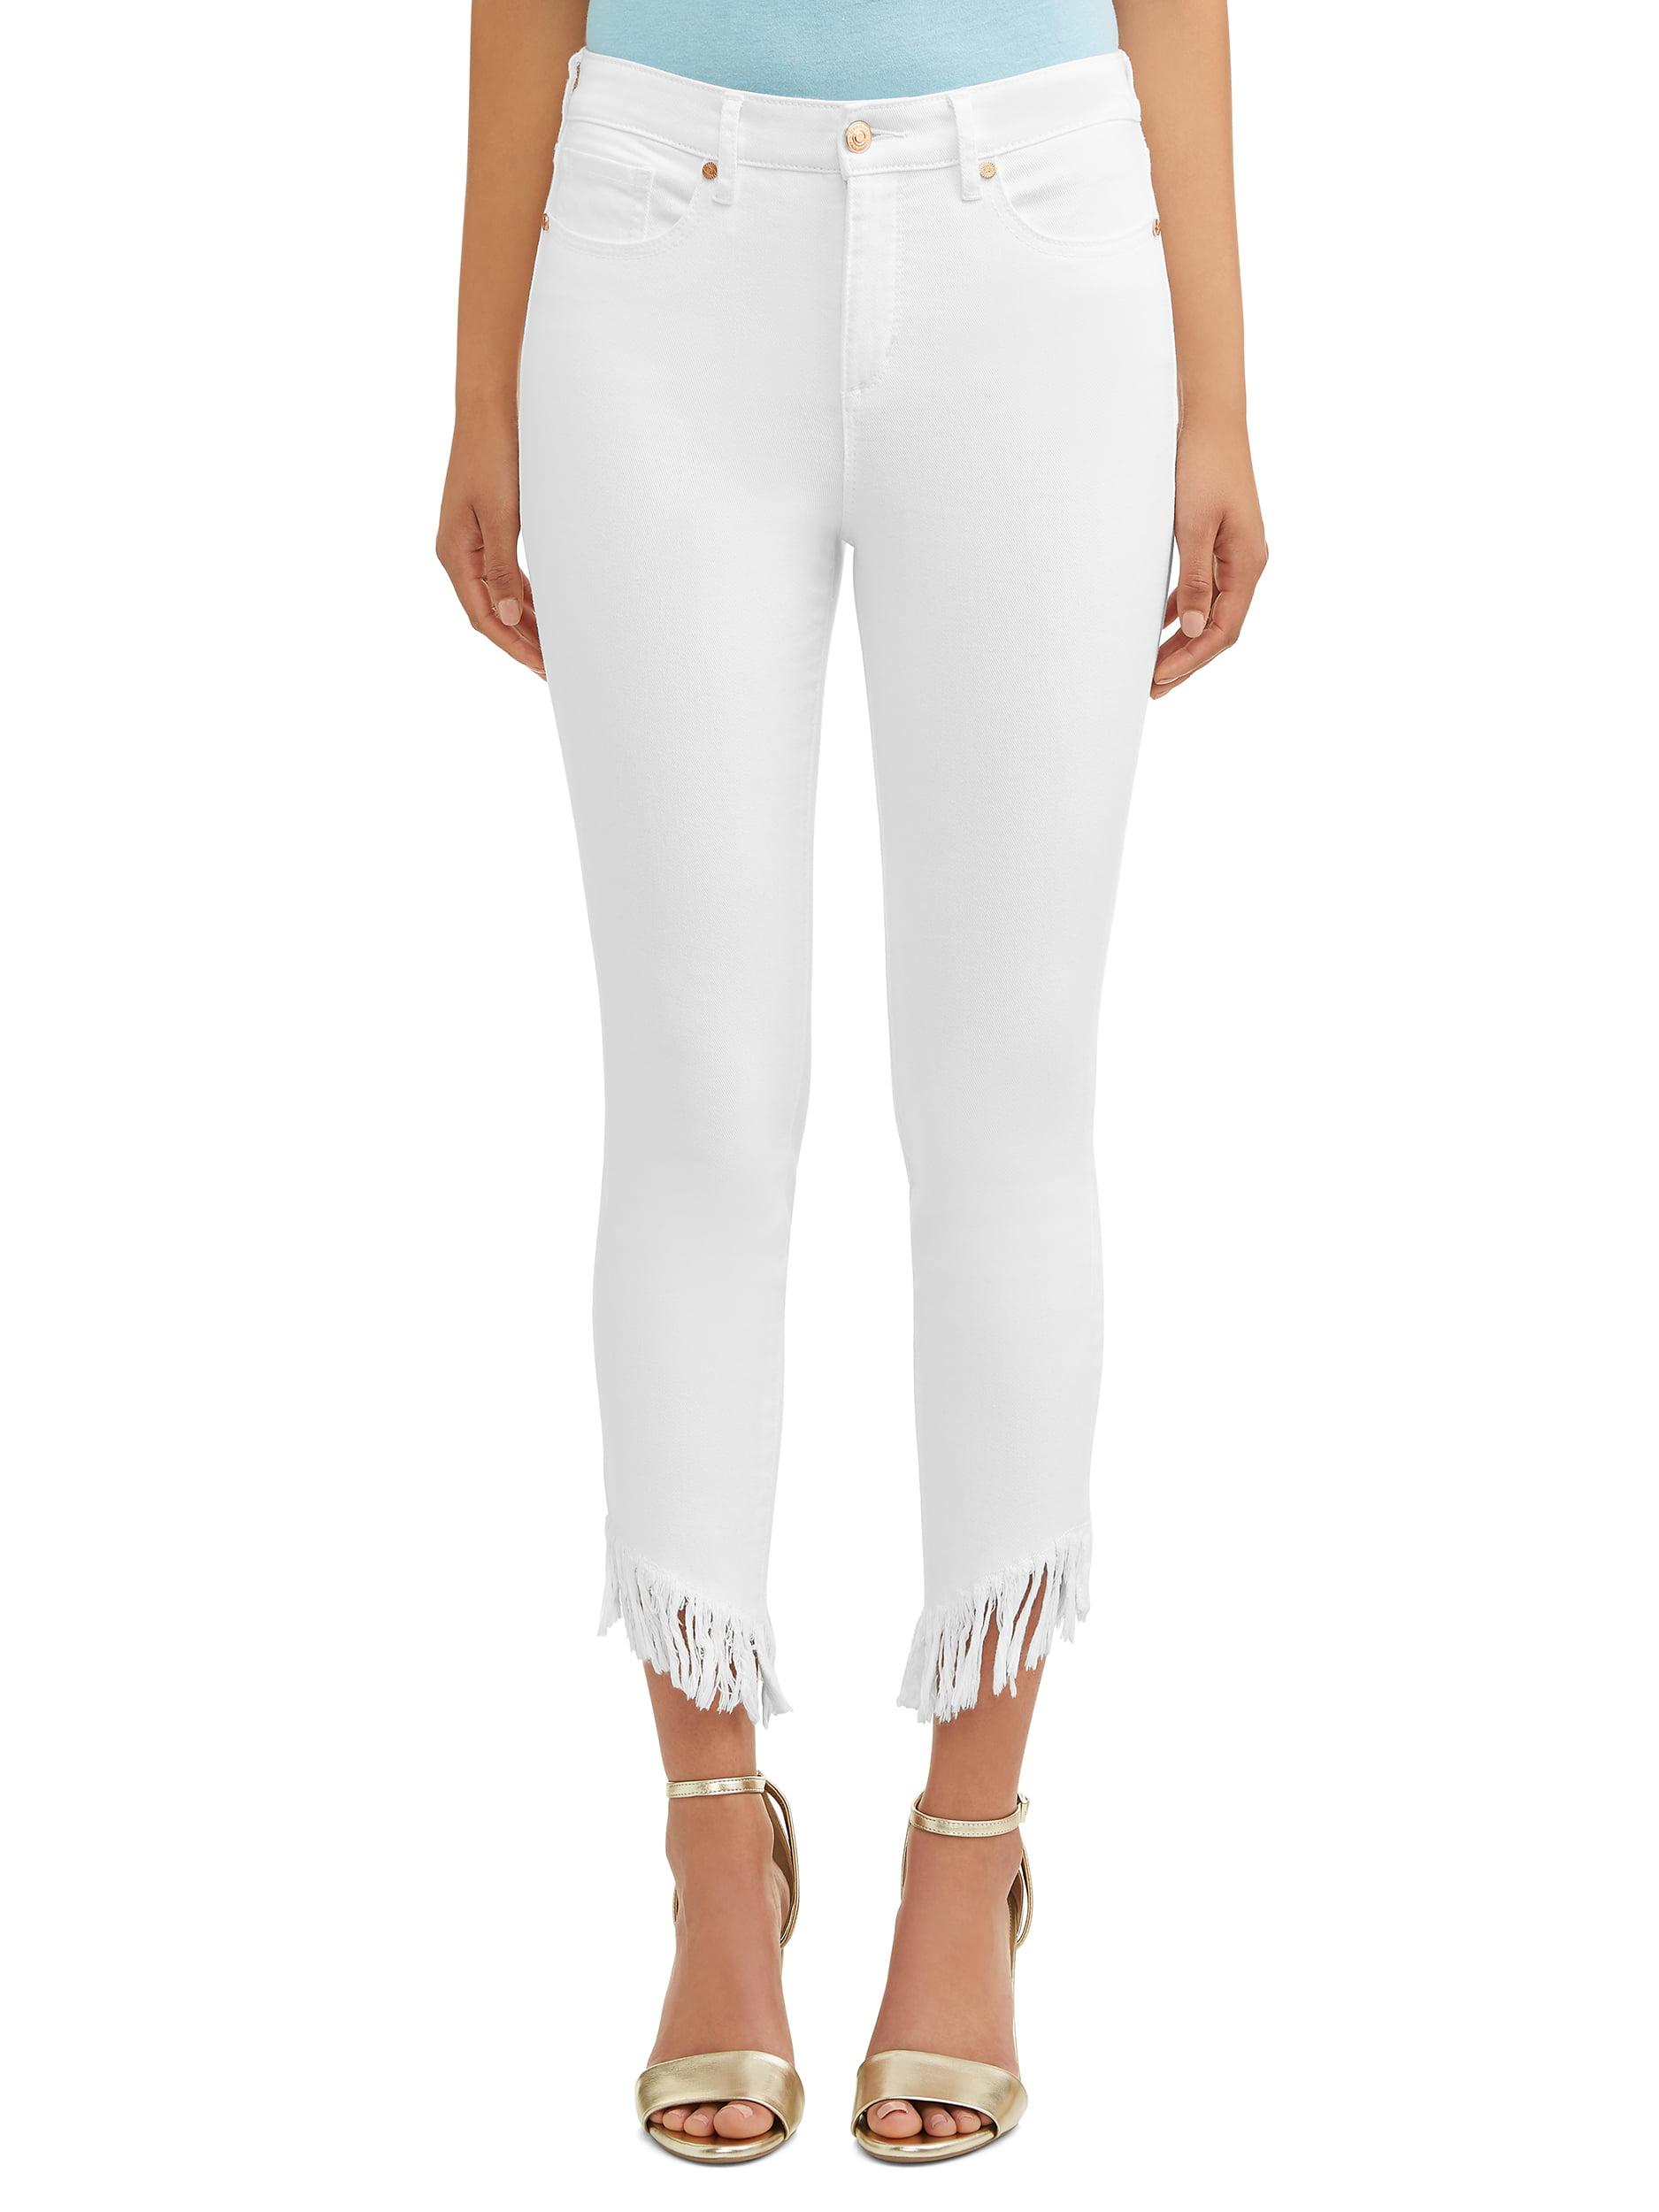 Rosa Curvy High Waist Fringed Hem Ankle Jean Women's (White)